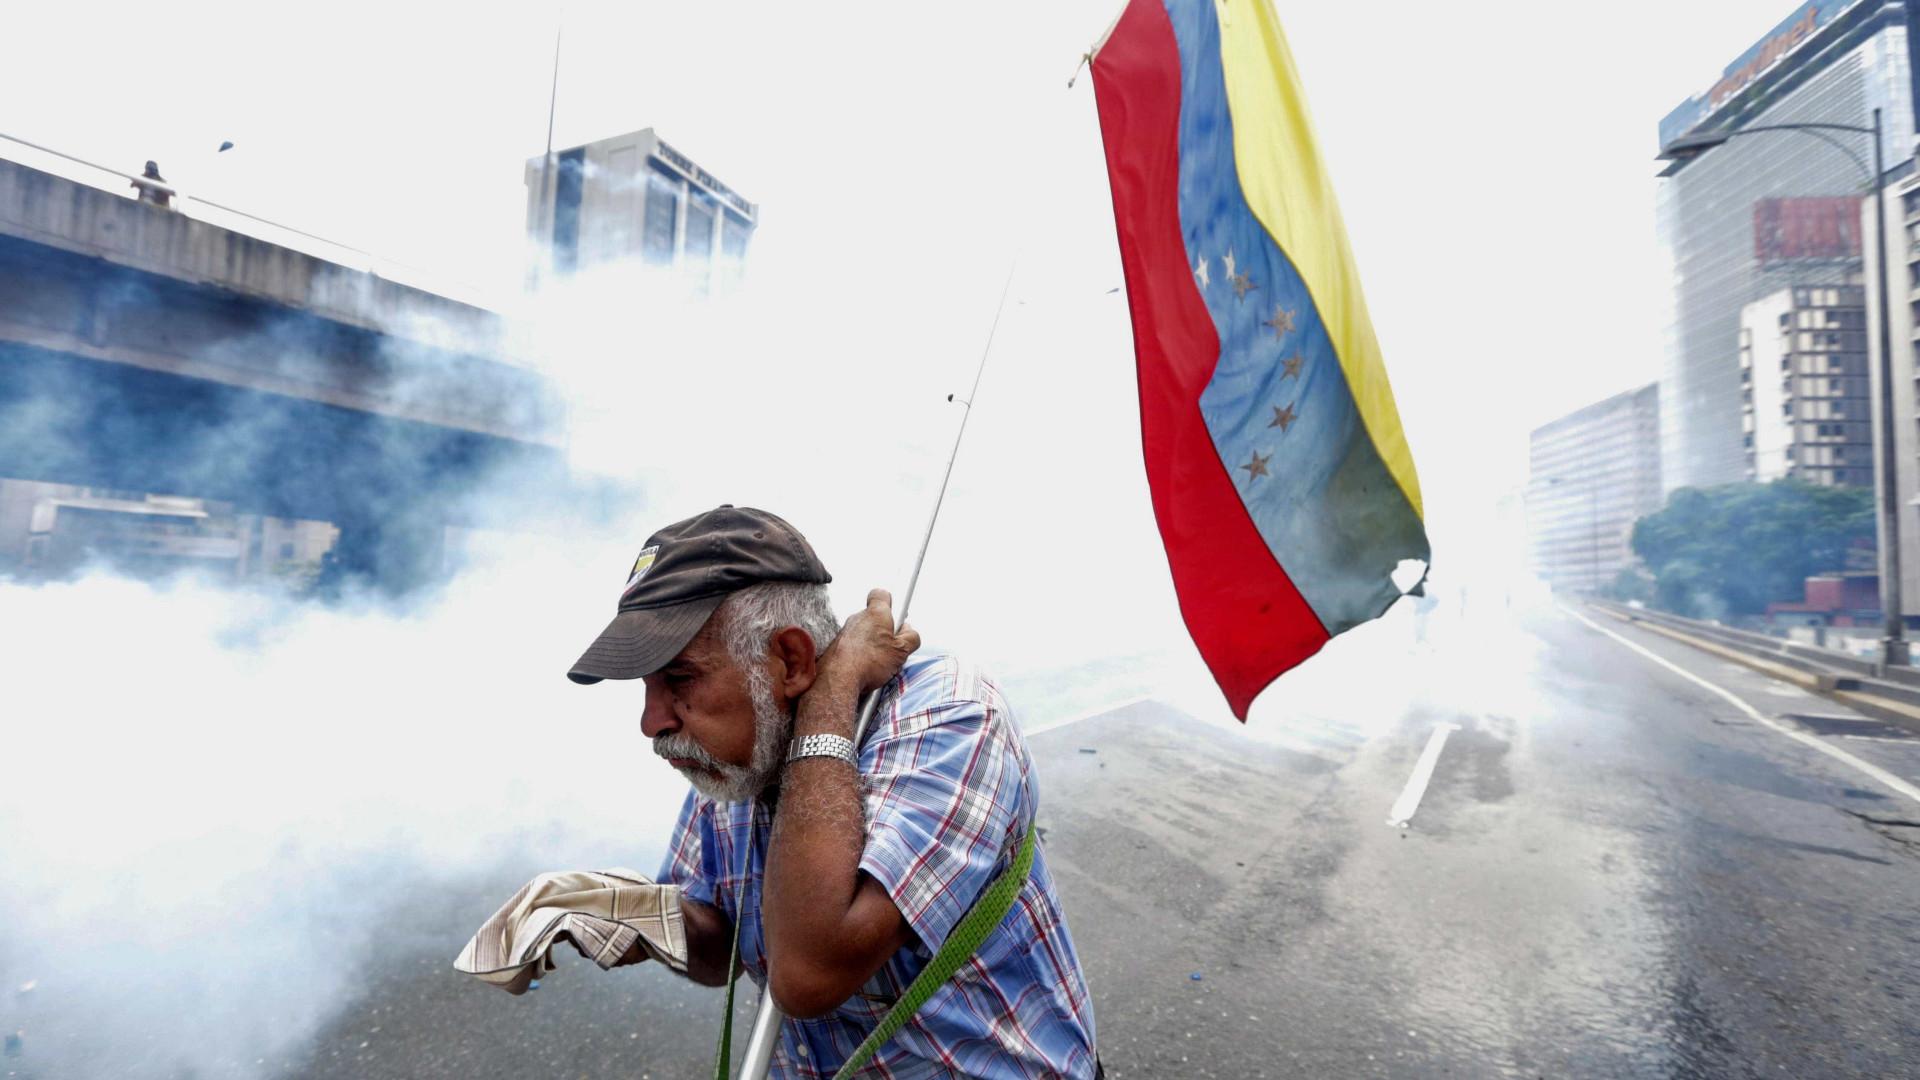 Polícia usa gás lacrimogénio para dispersar opositores de Maduro